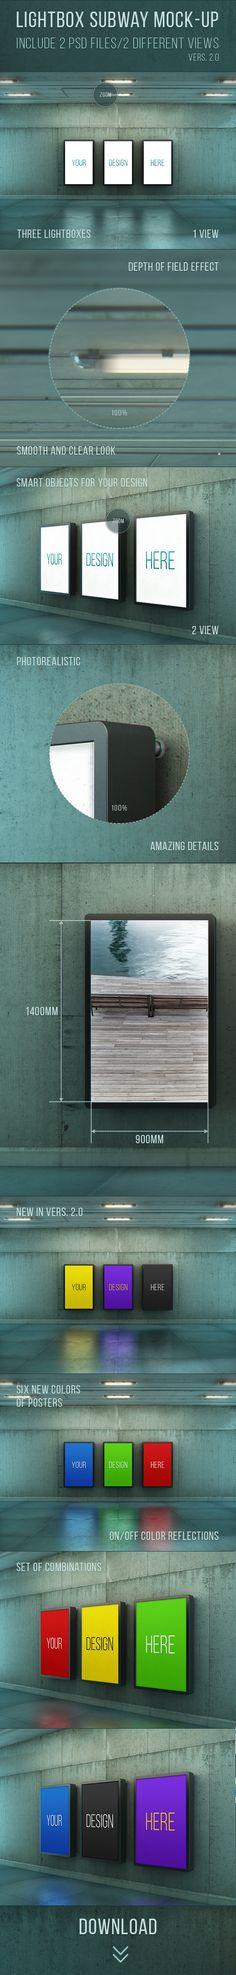 Poster Urban Subway Lightbox Mock-ups on Behance